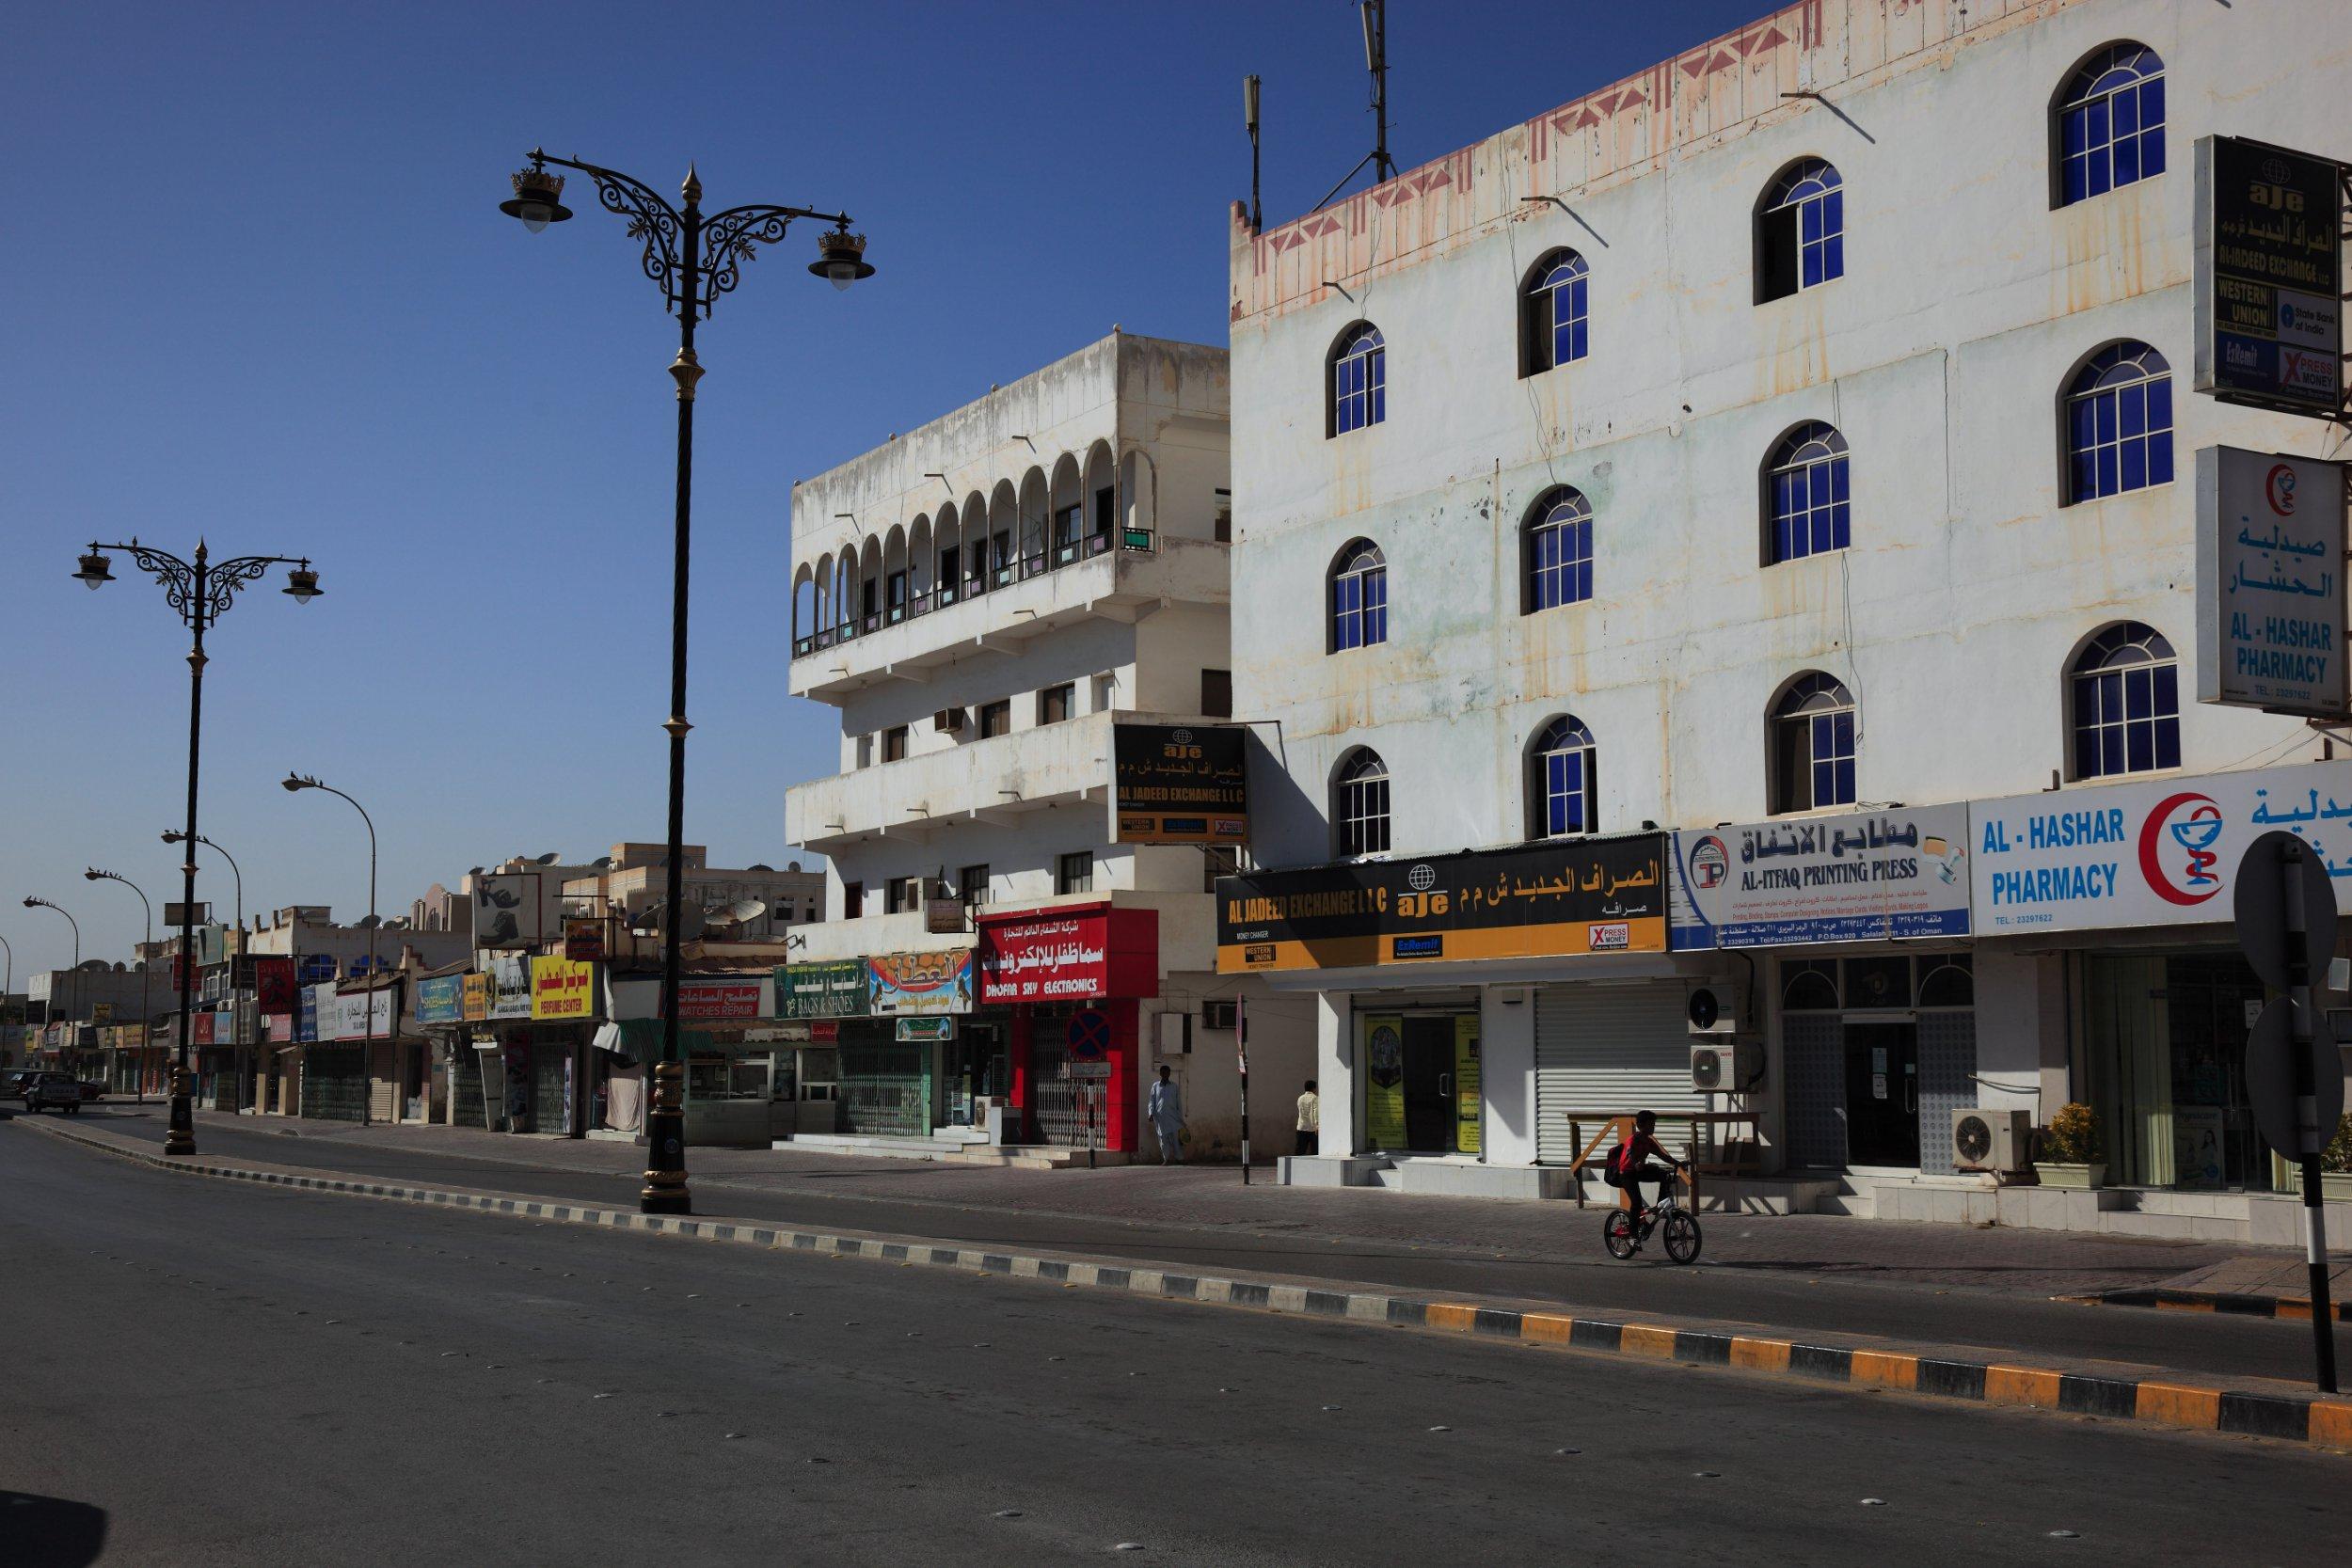 City centre of Salalah, Oman (Photo by: Bildagentur-online/UIG via Getty Images)